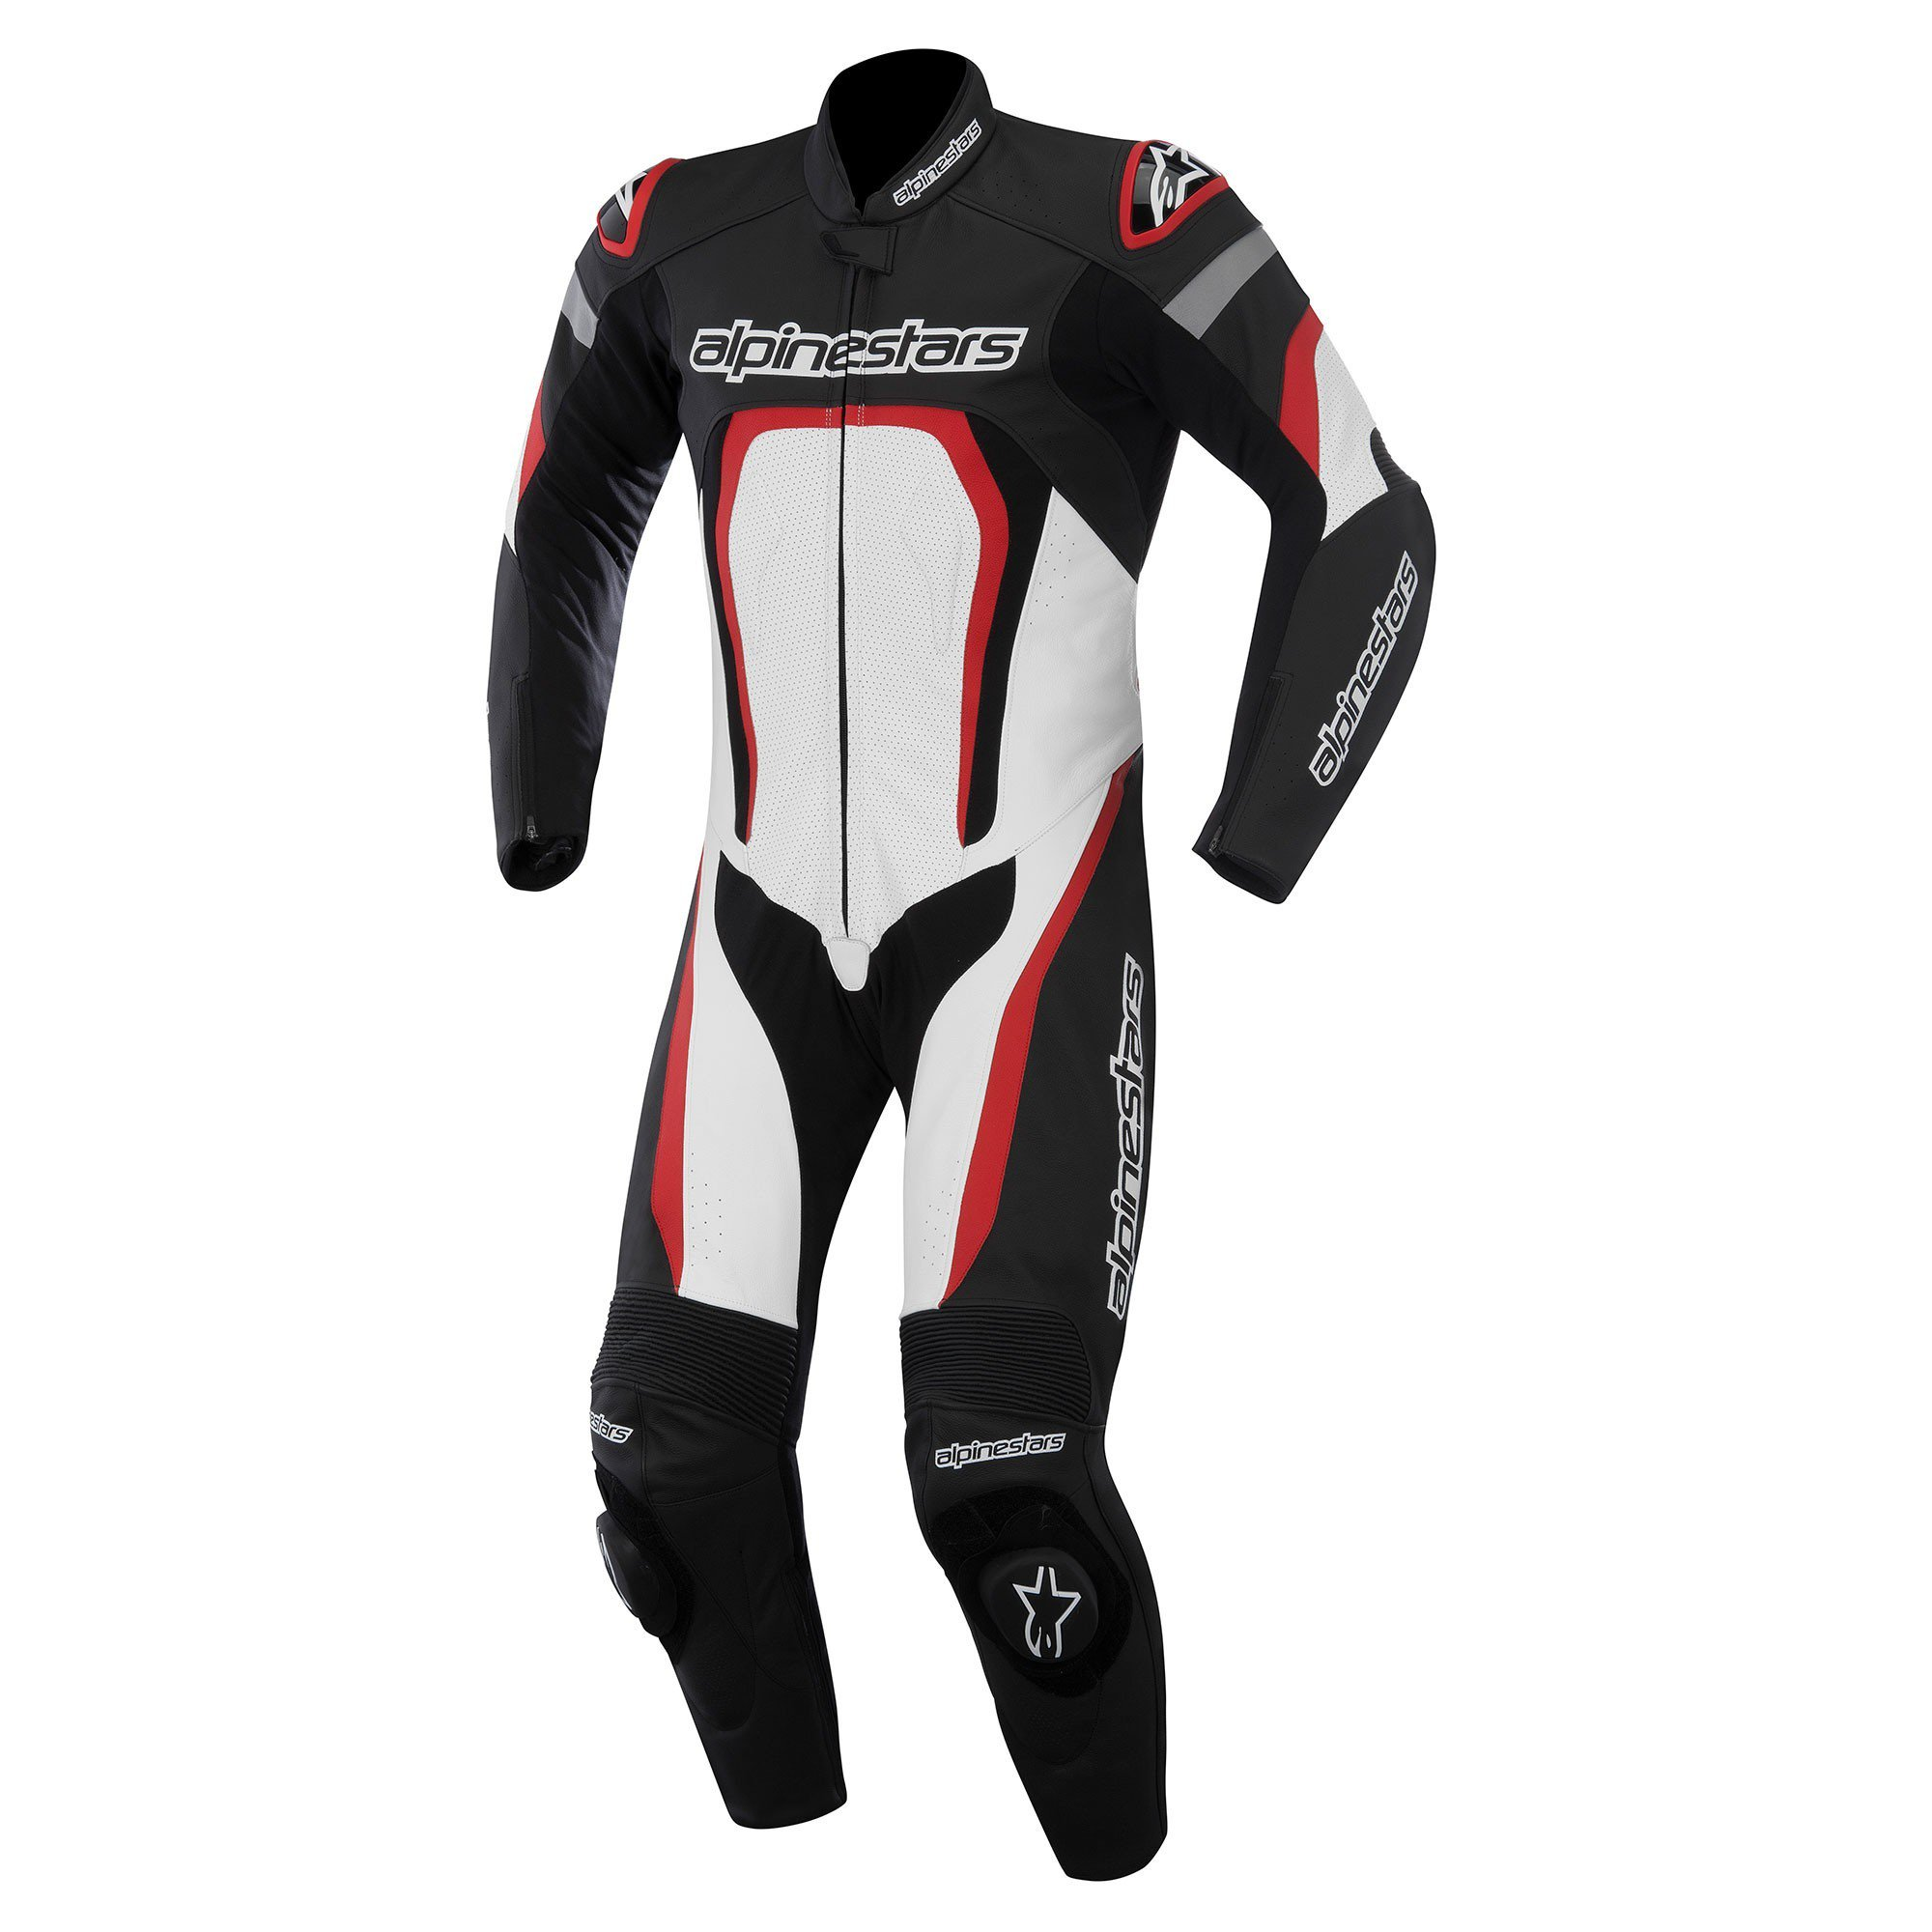 Alpinestars Motegi 1PC Suit Black/White/Red 54